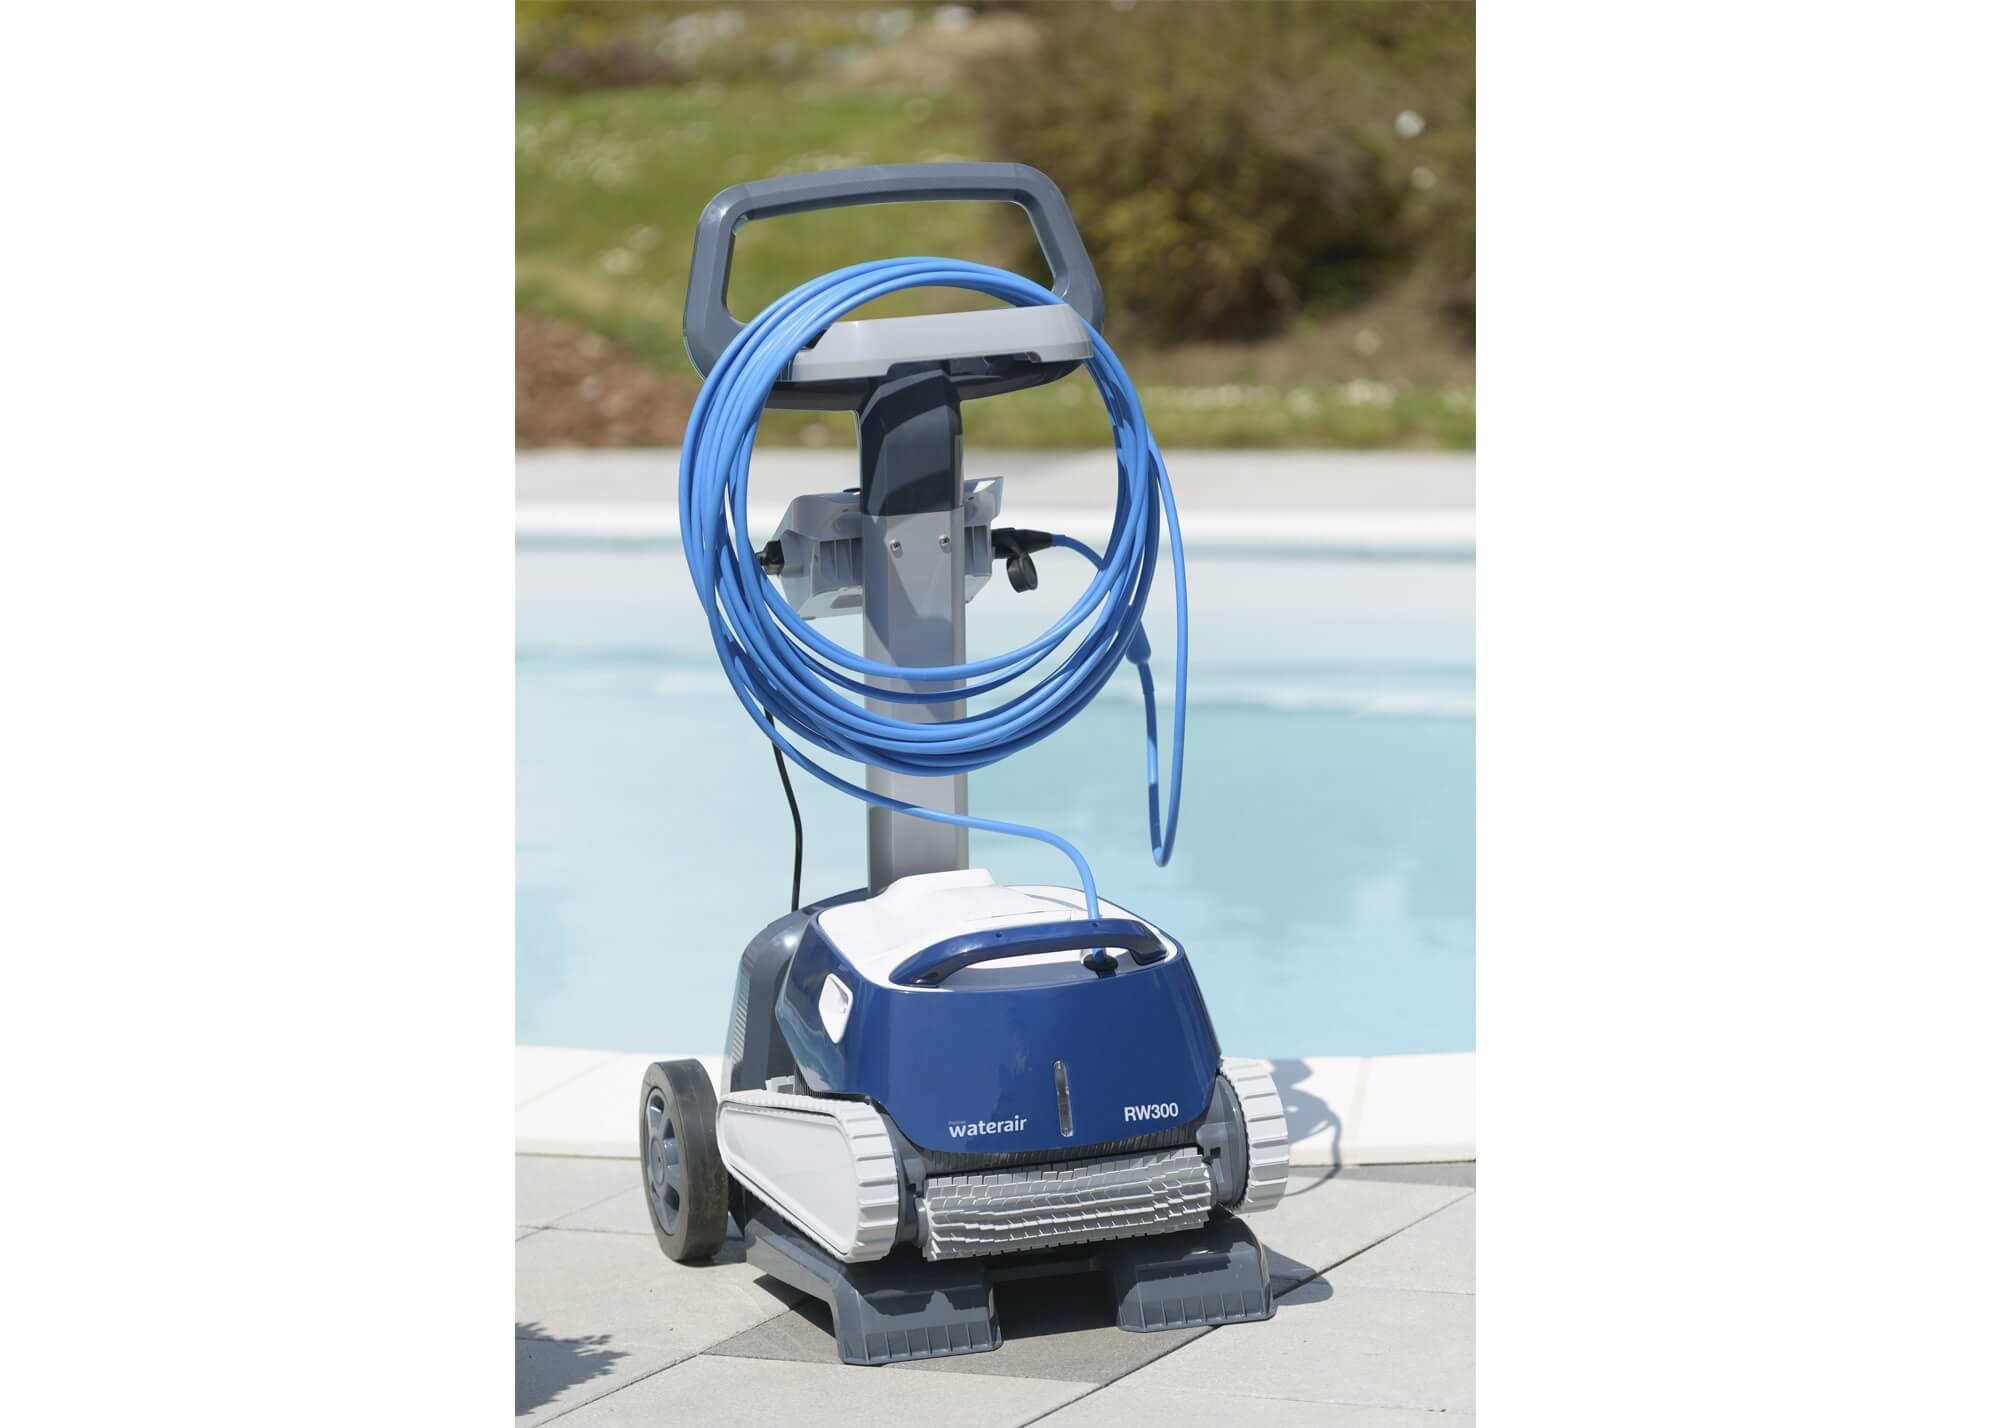 Robot waterair rw300 piscines waterair for Robot piscine waterair